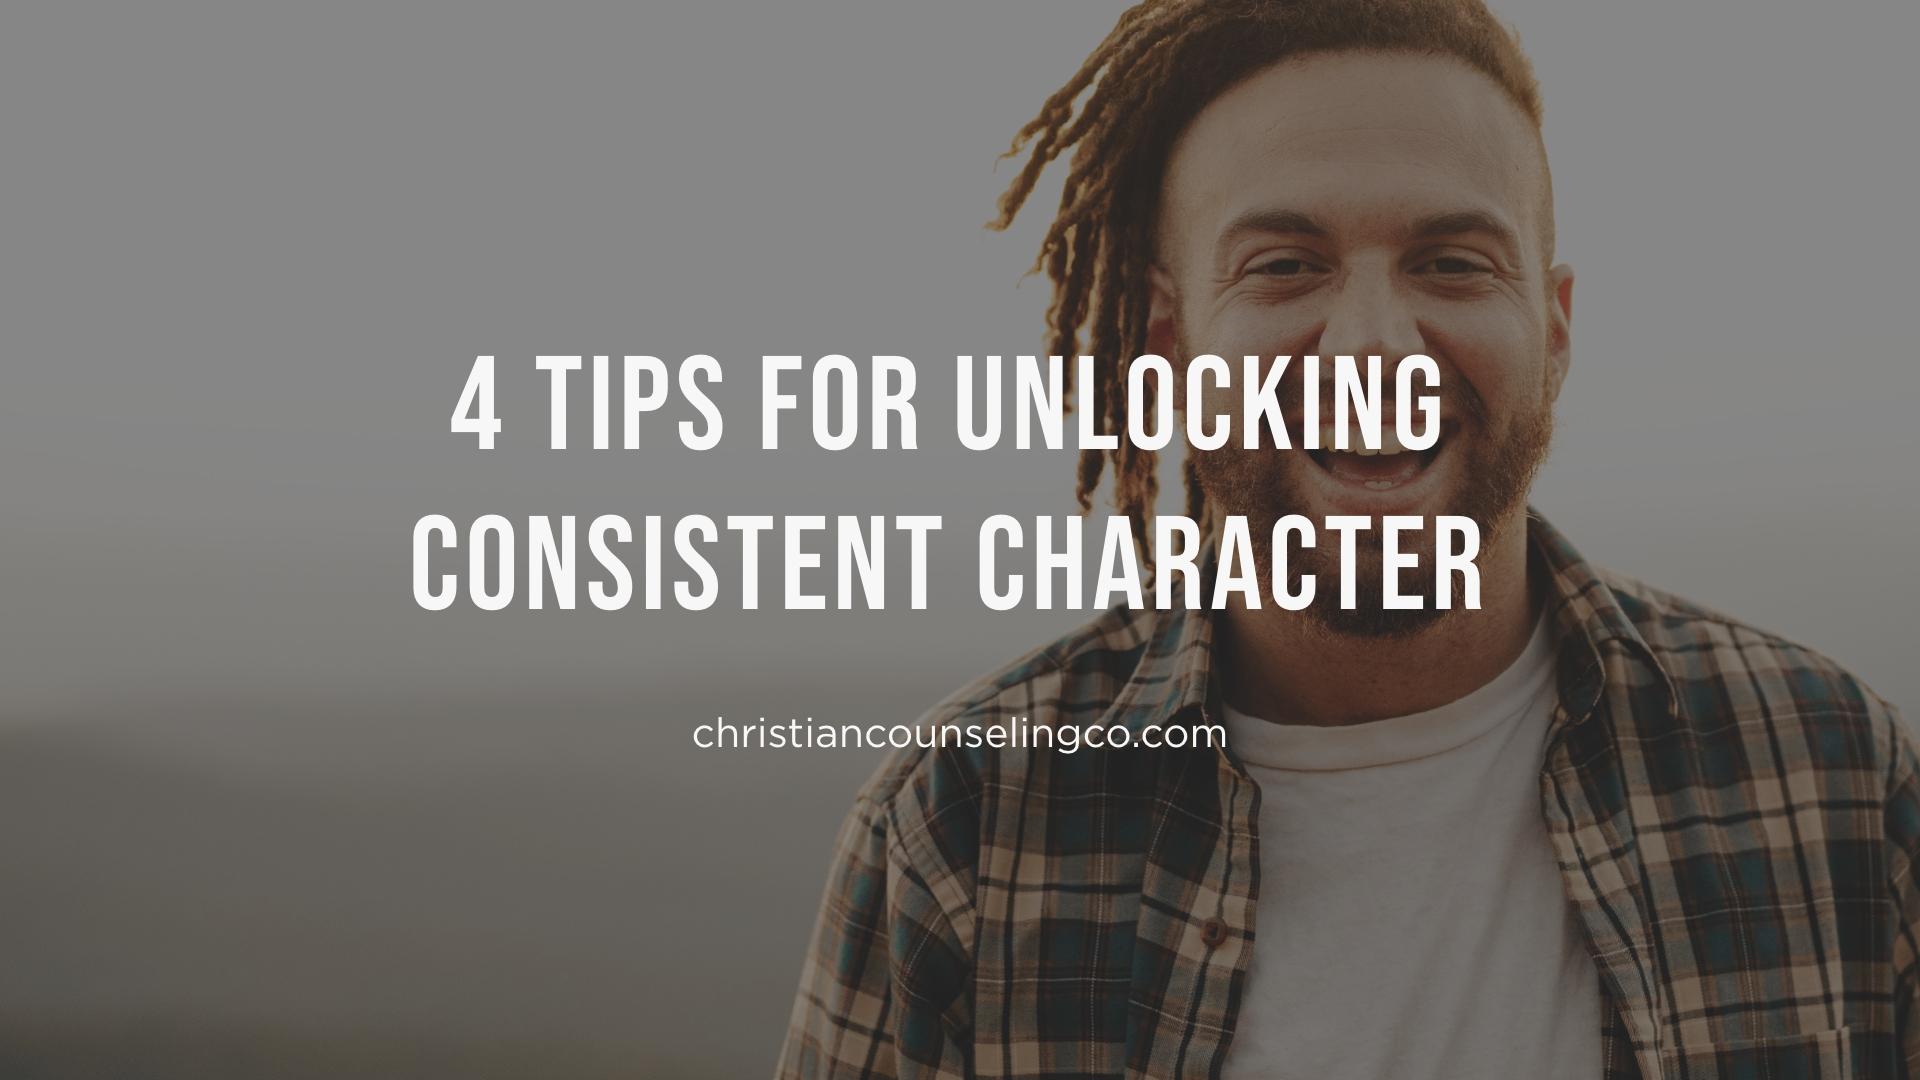 unlocking consistent character